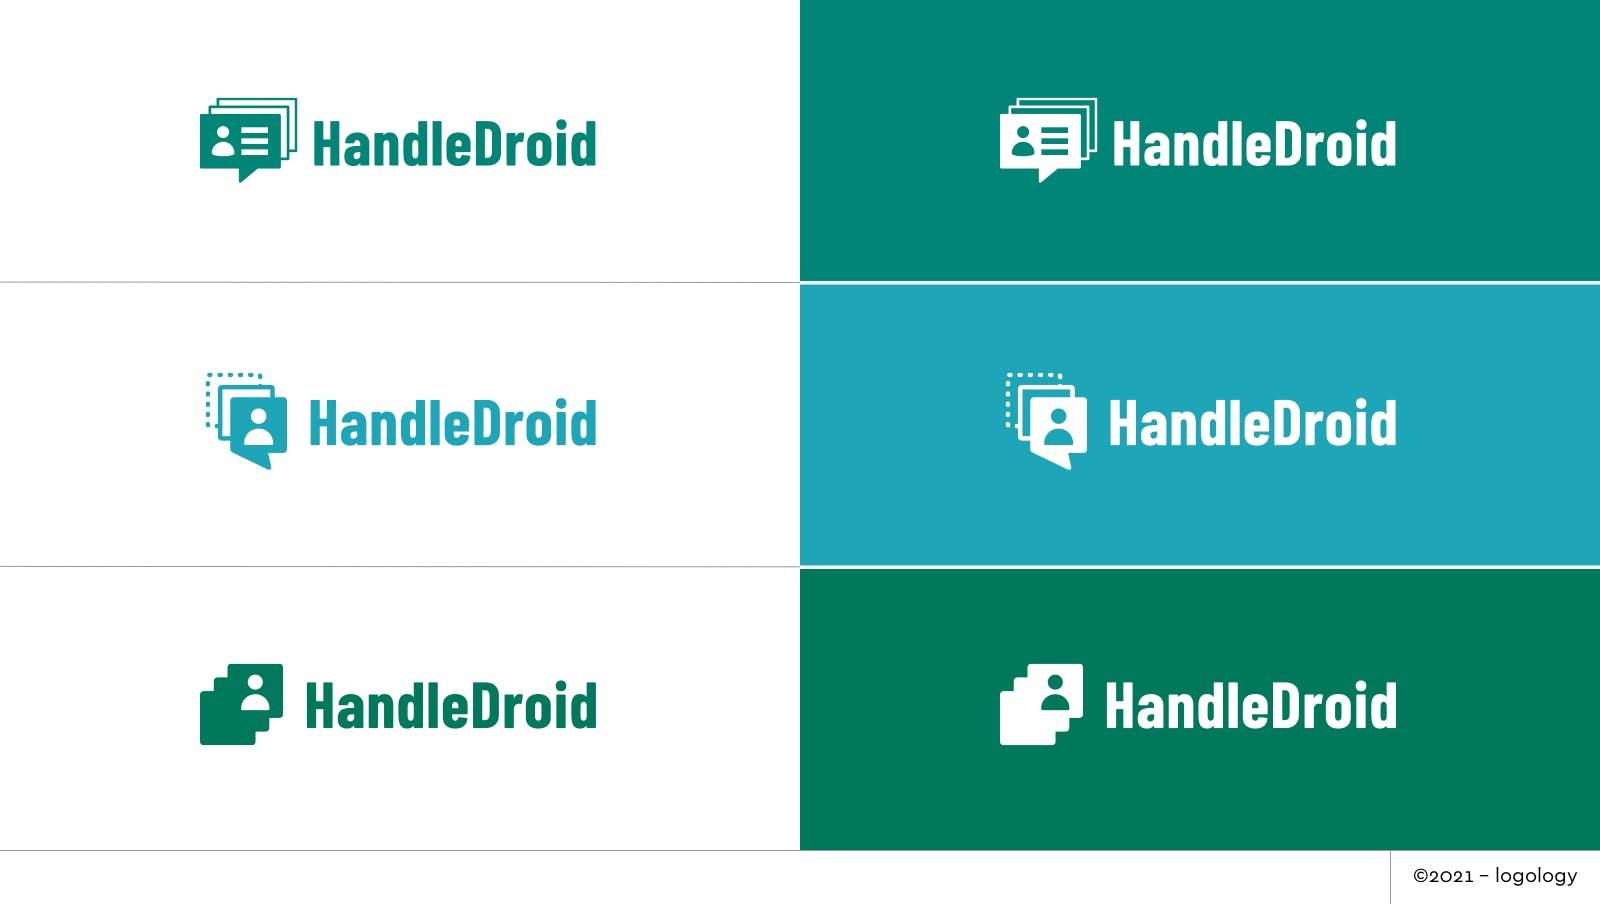 handledroid logo proposals